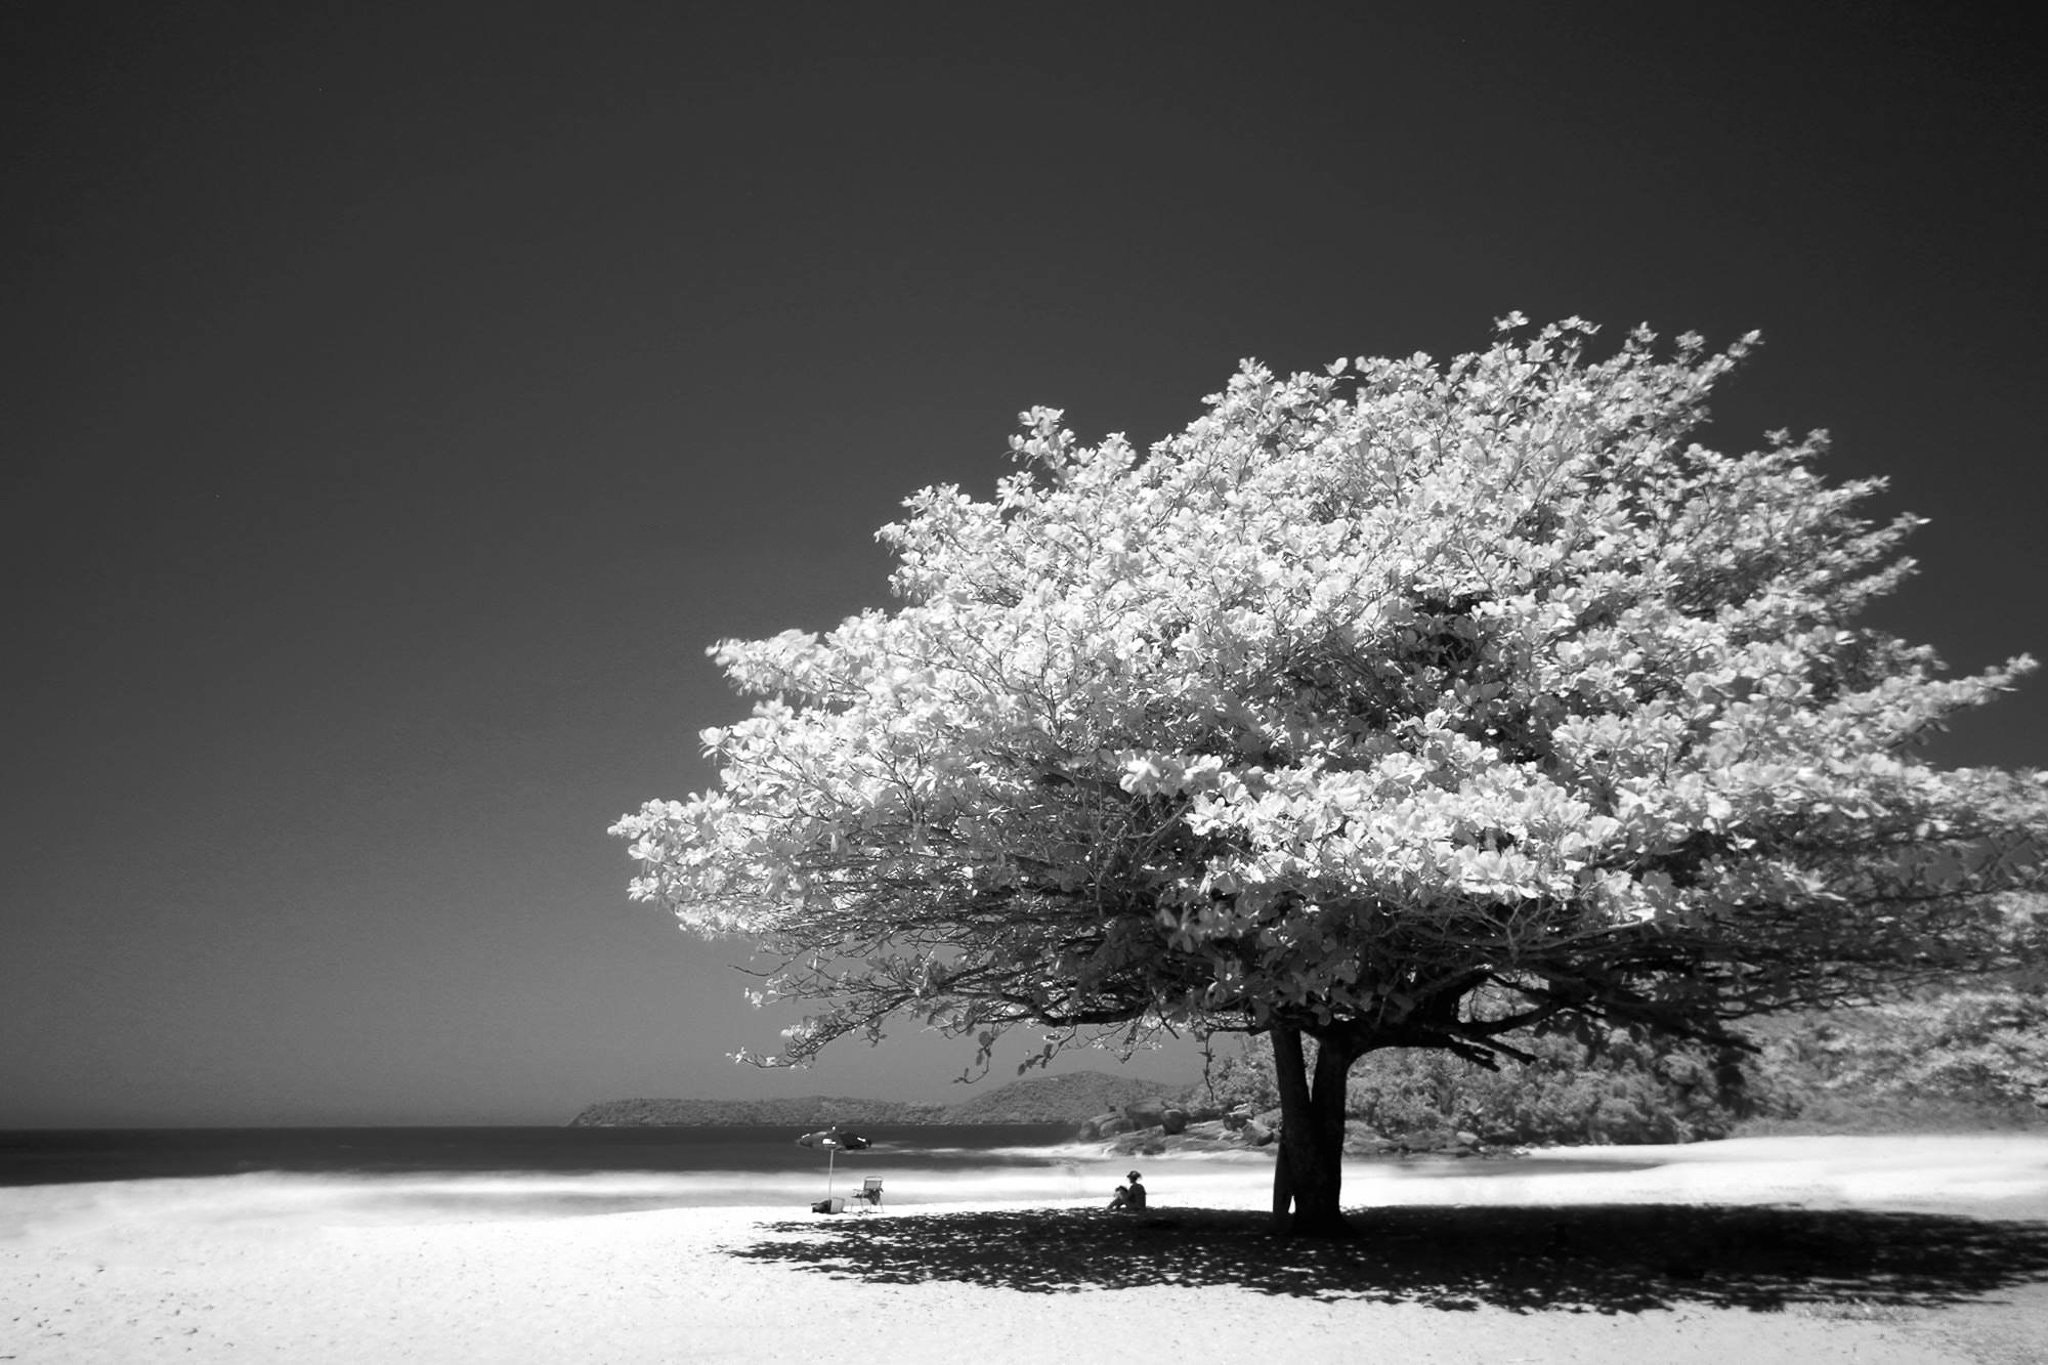 Big tree photo